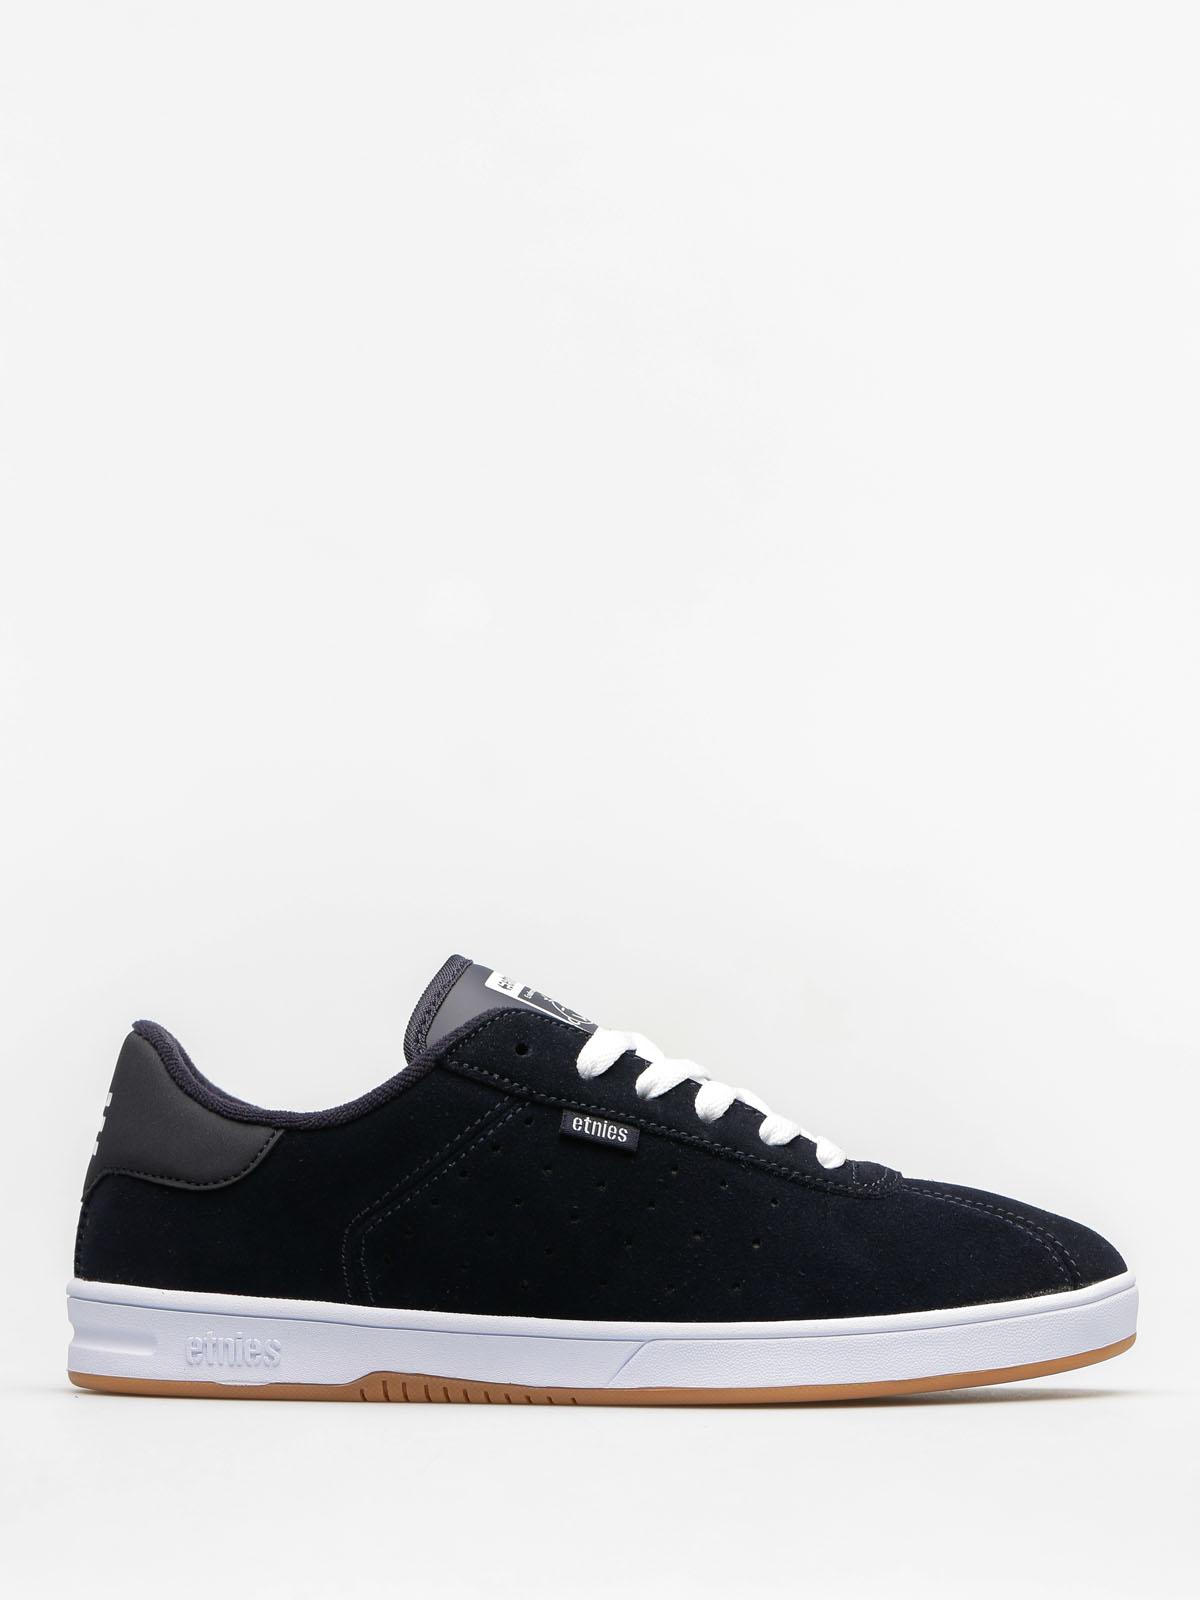 a3a45ed1a8 Etnies Shoes The Scam (navy white gum)